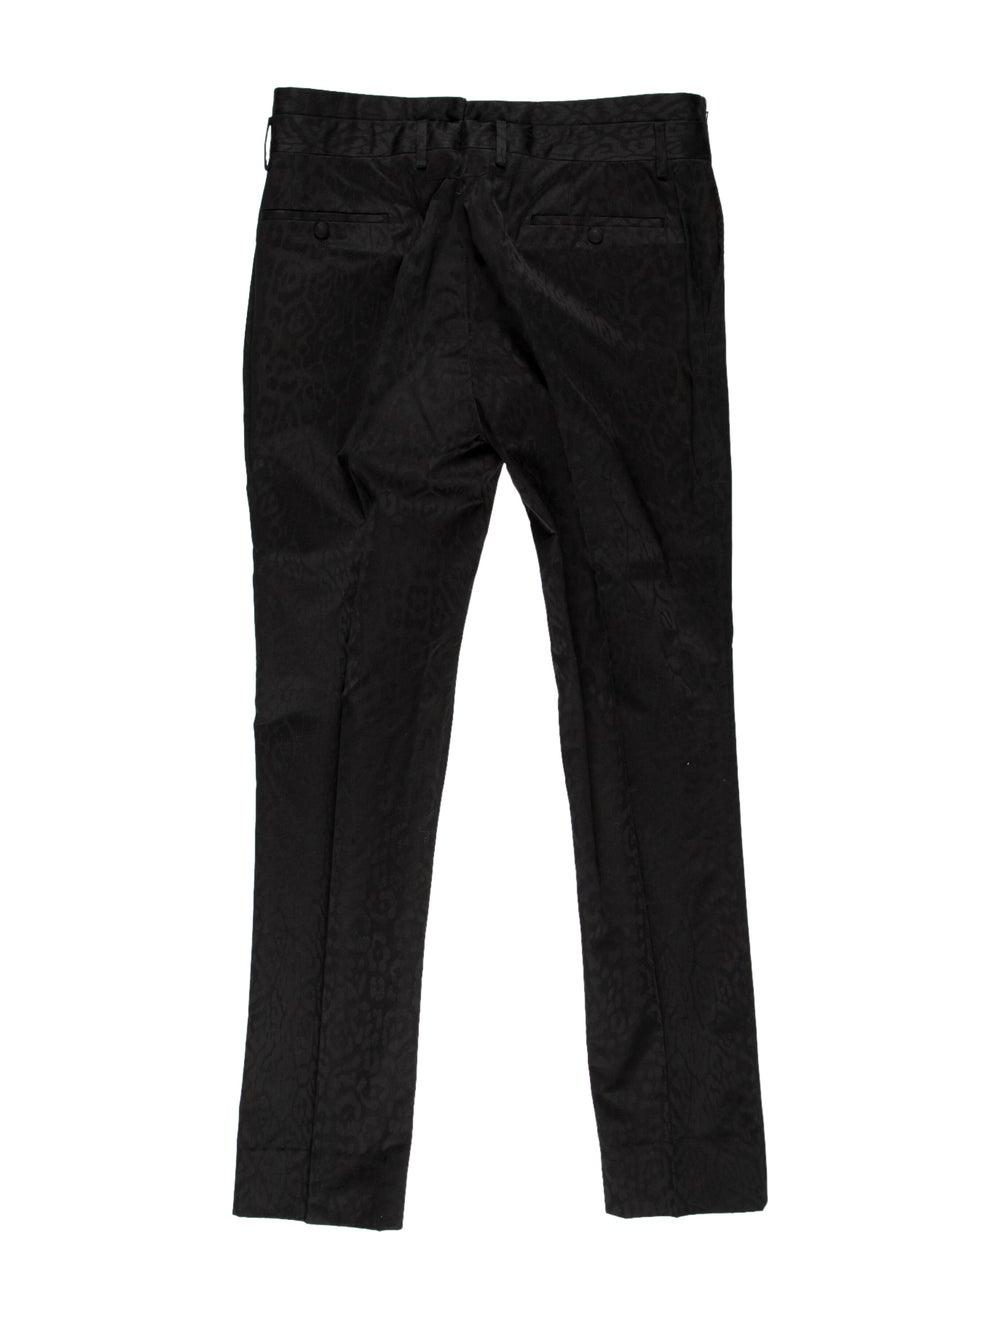 Givenchy Animal Print Flat Front Pants black - image 2